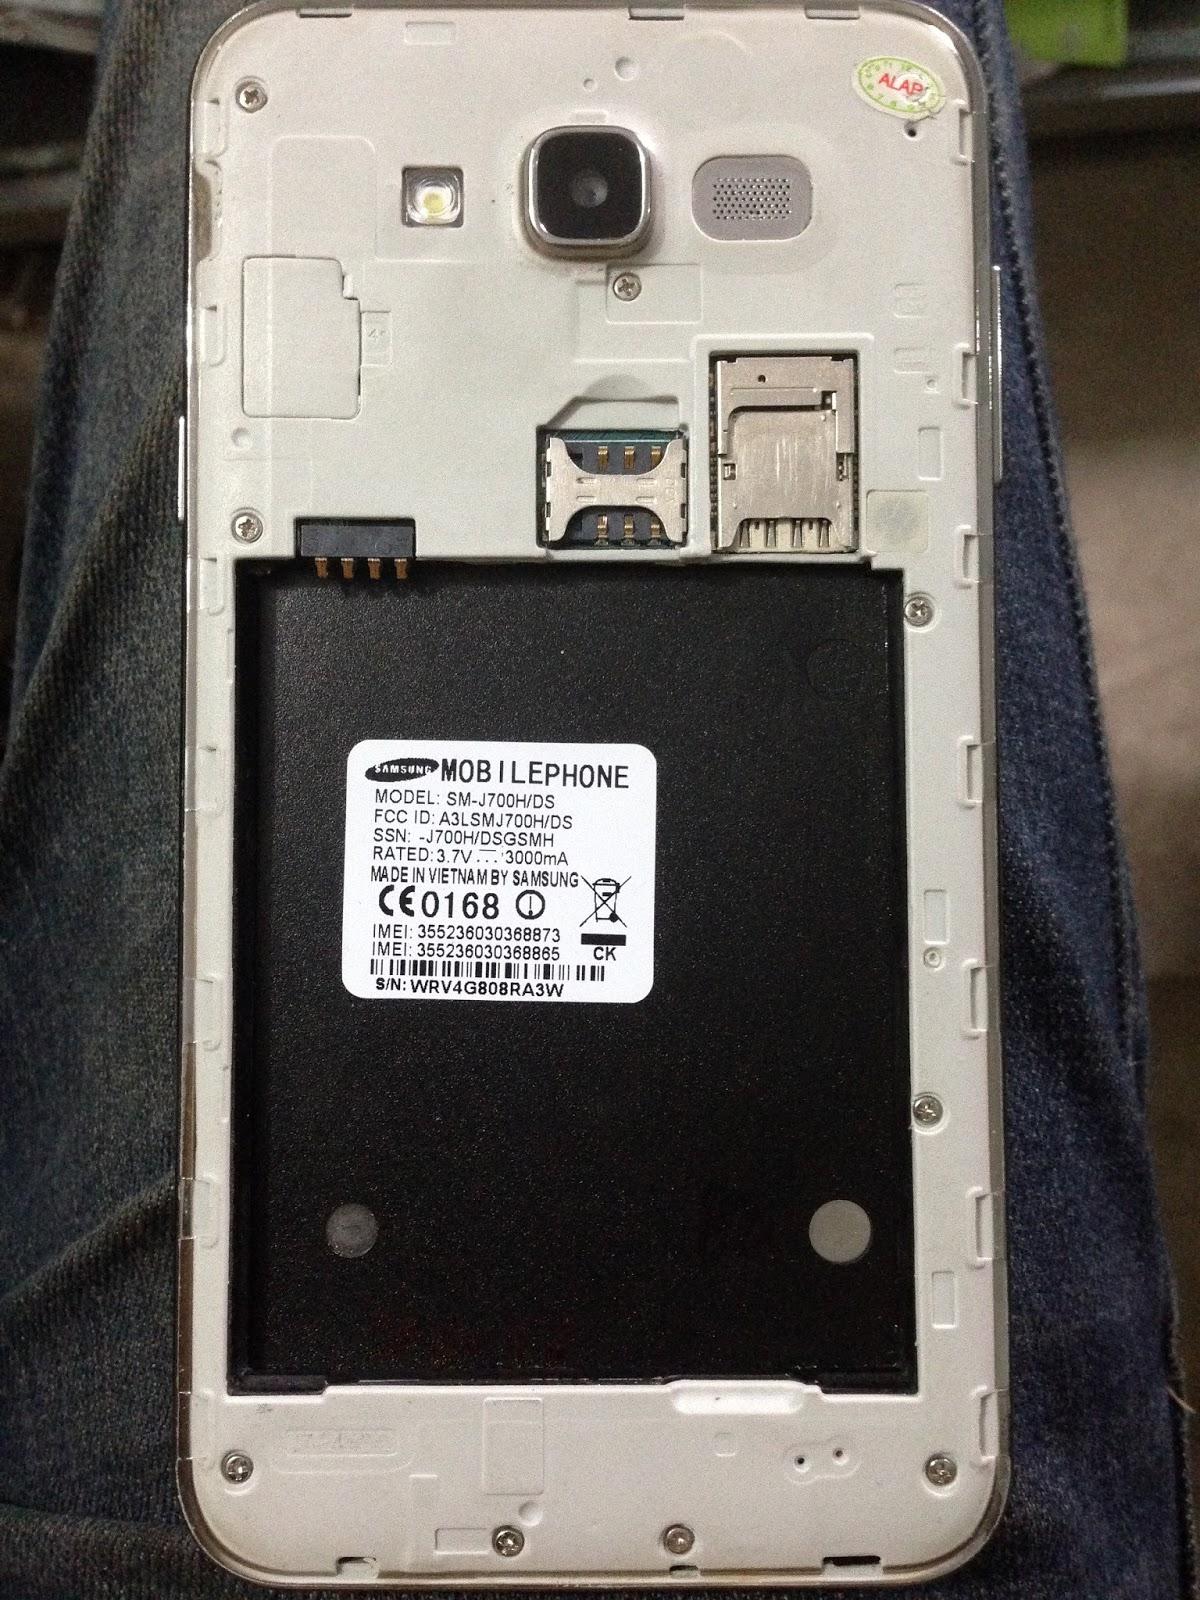 Samsung j700h firmware - Mt6582__samsung__sm J700h__galaxy_j7__4 2 2__j8270_4 2_v1 8_tzap